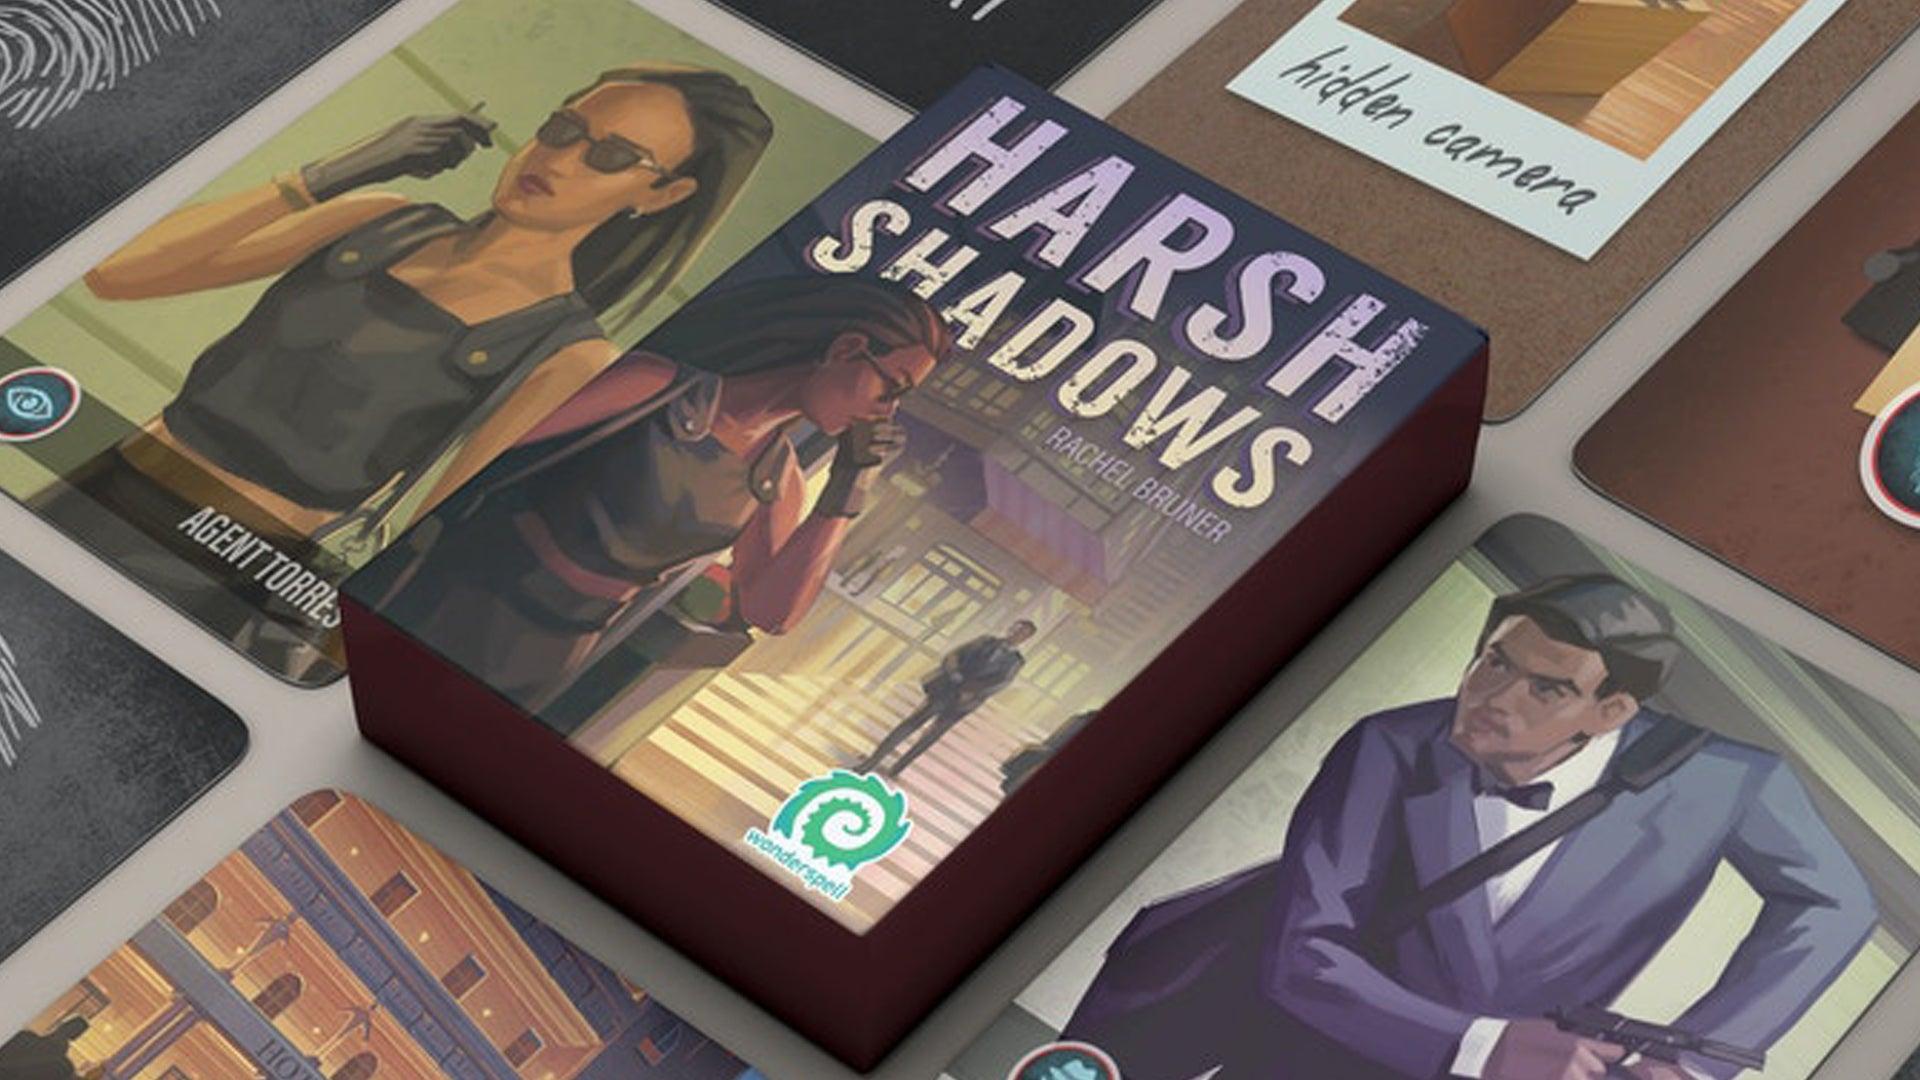 Harsh Shadows promo image